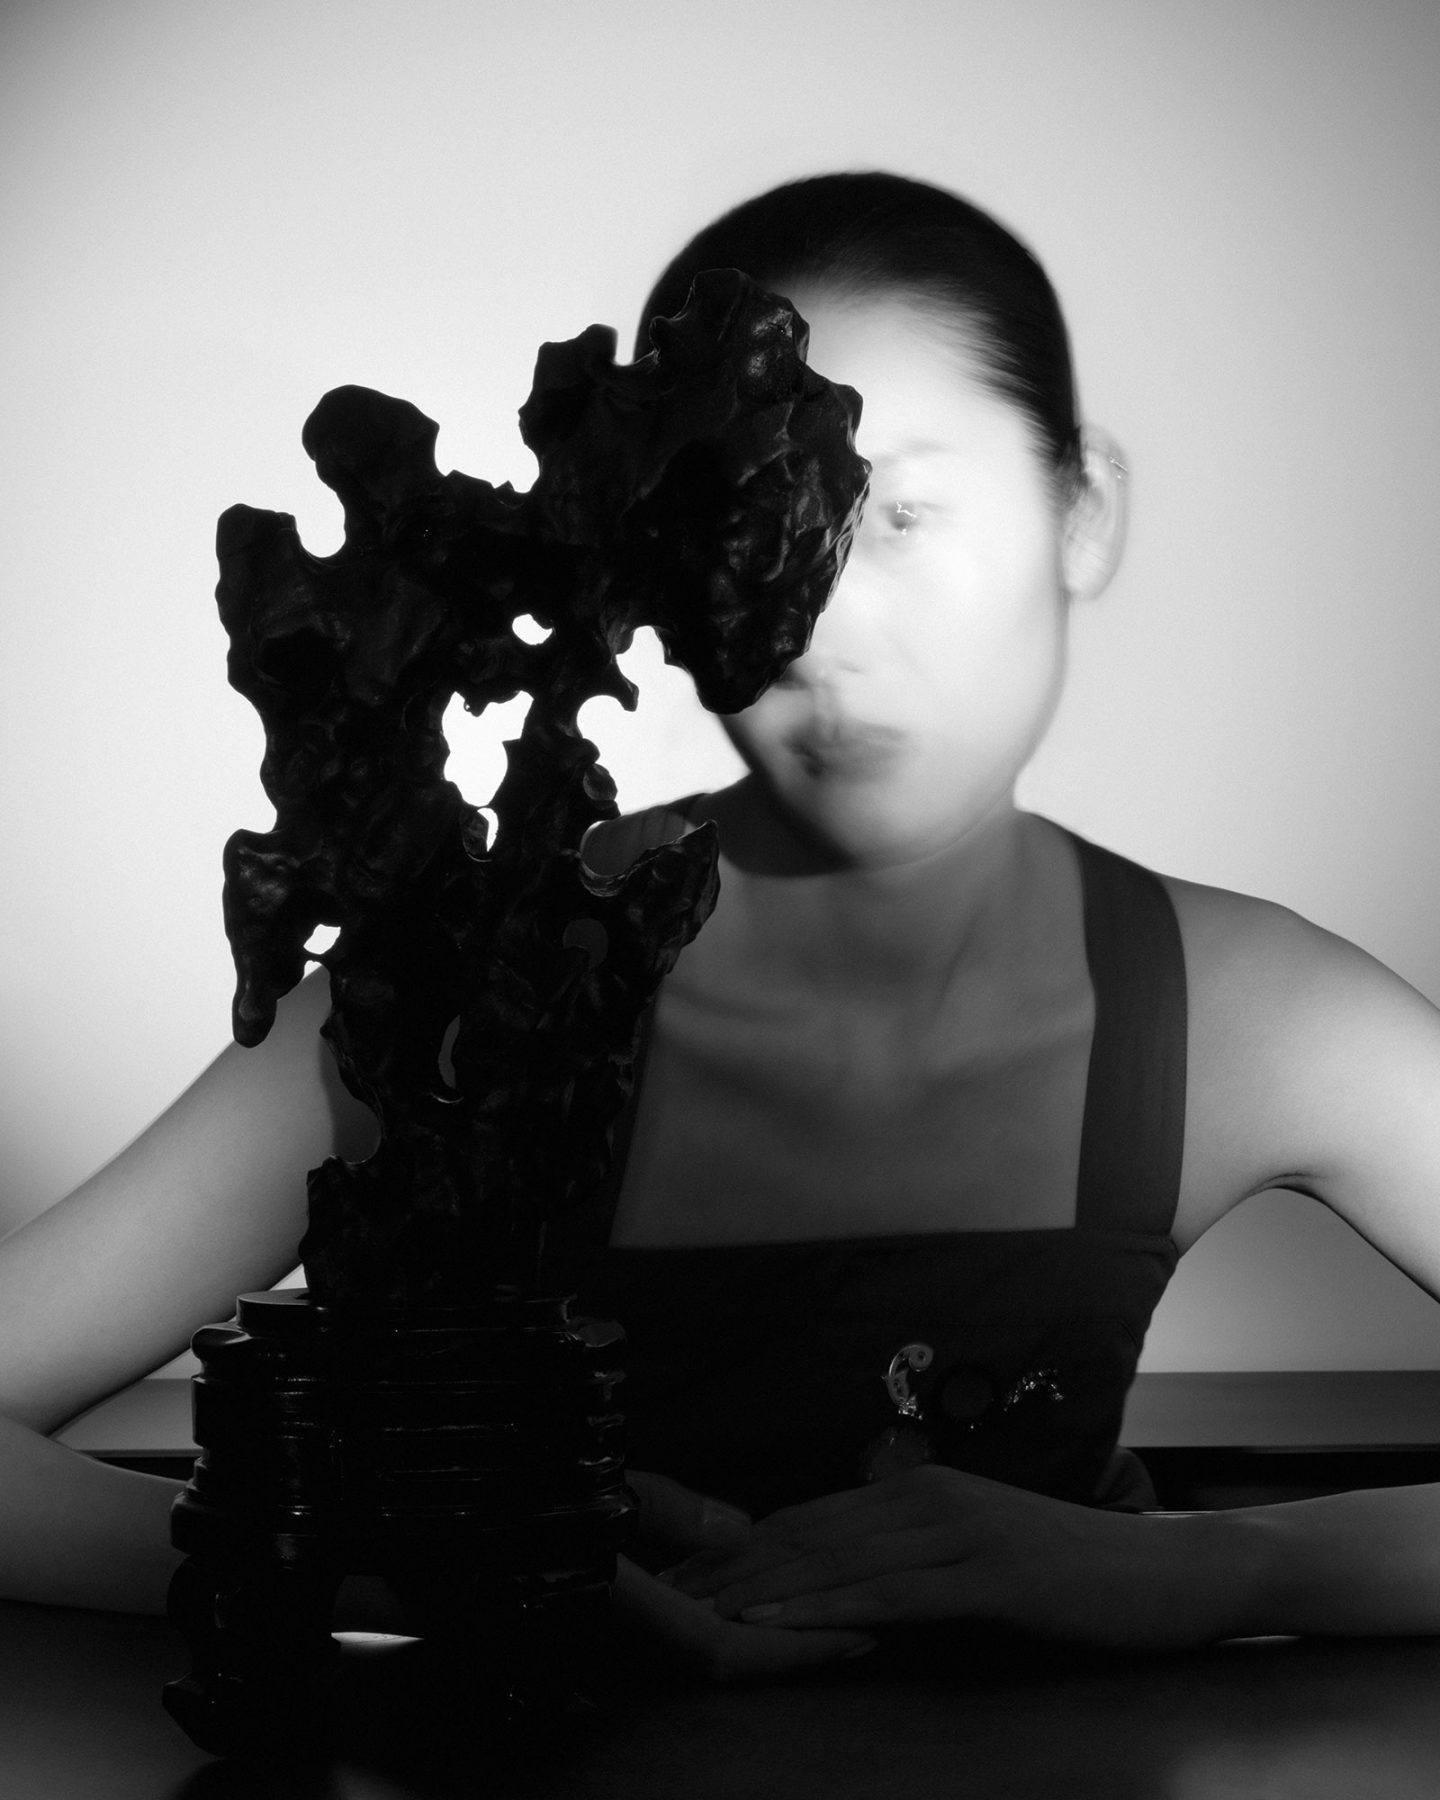 IGNANT-Photography-MarcusSchaefer-05